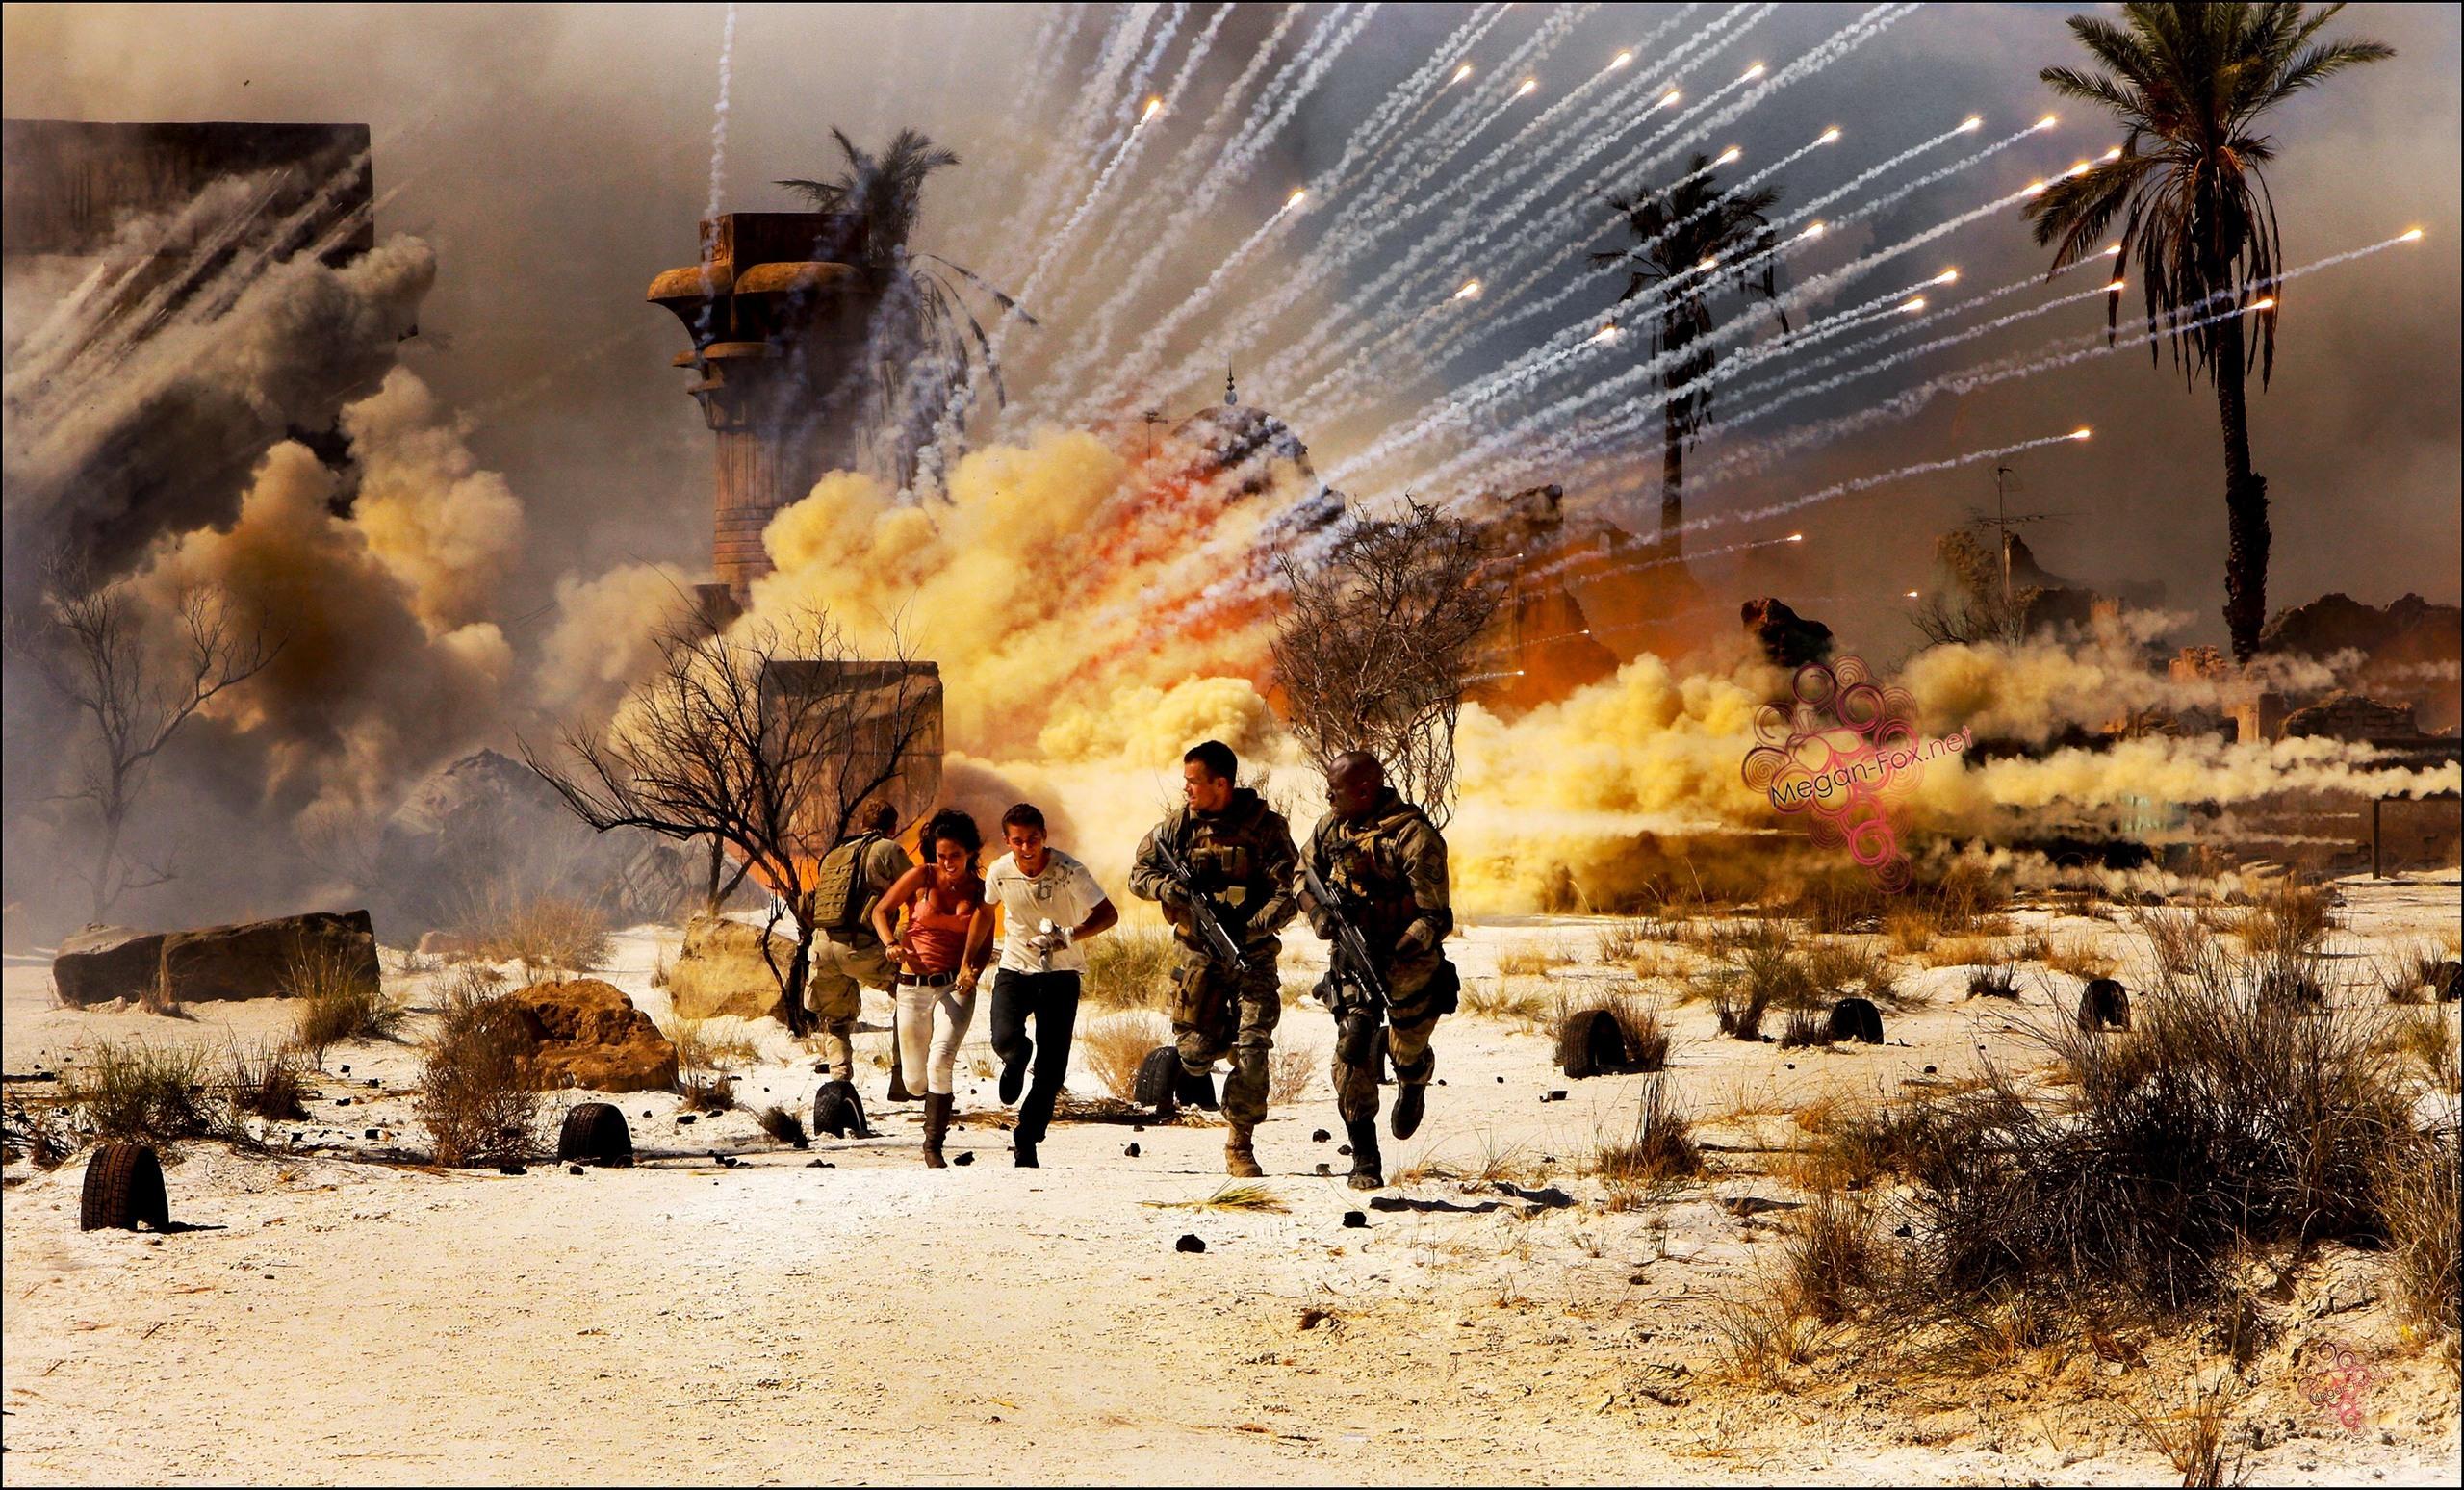 Transformers-Revenge-of-the-Fallen-Movie-Stills-transformers-5305625-2560-1548